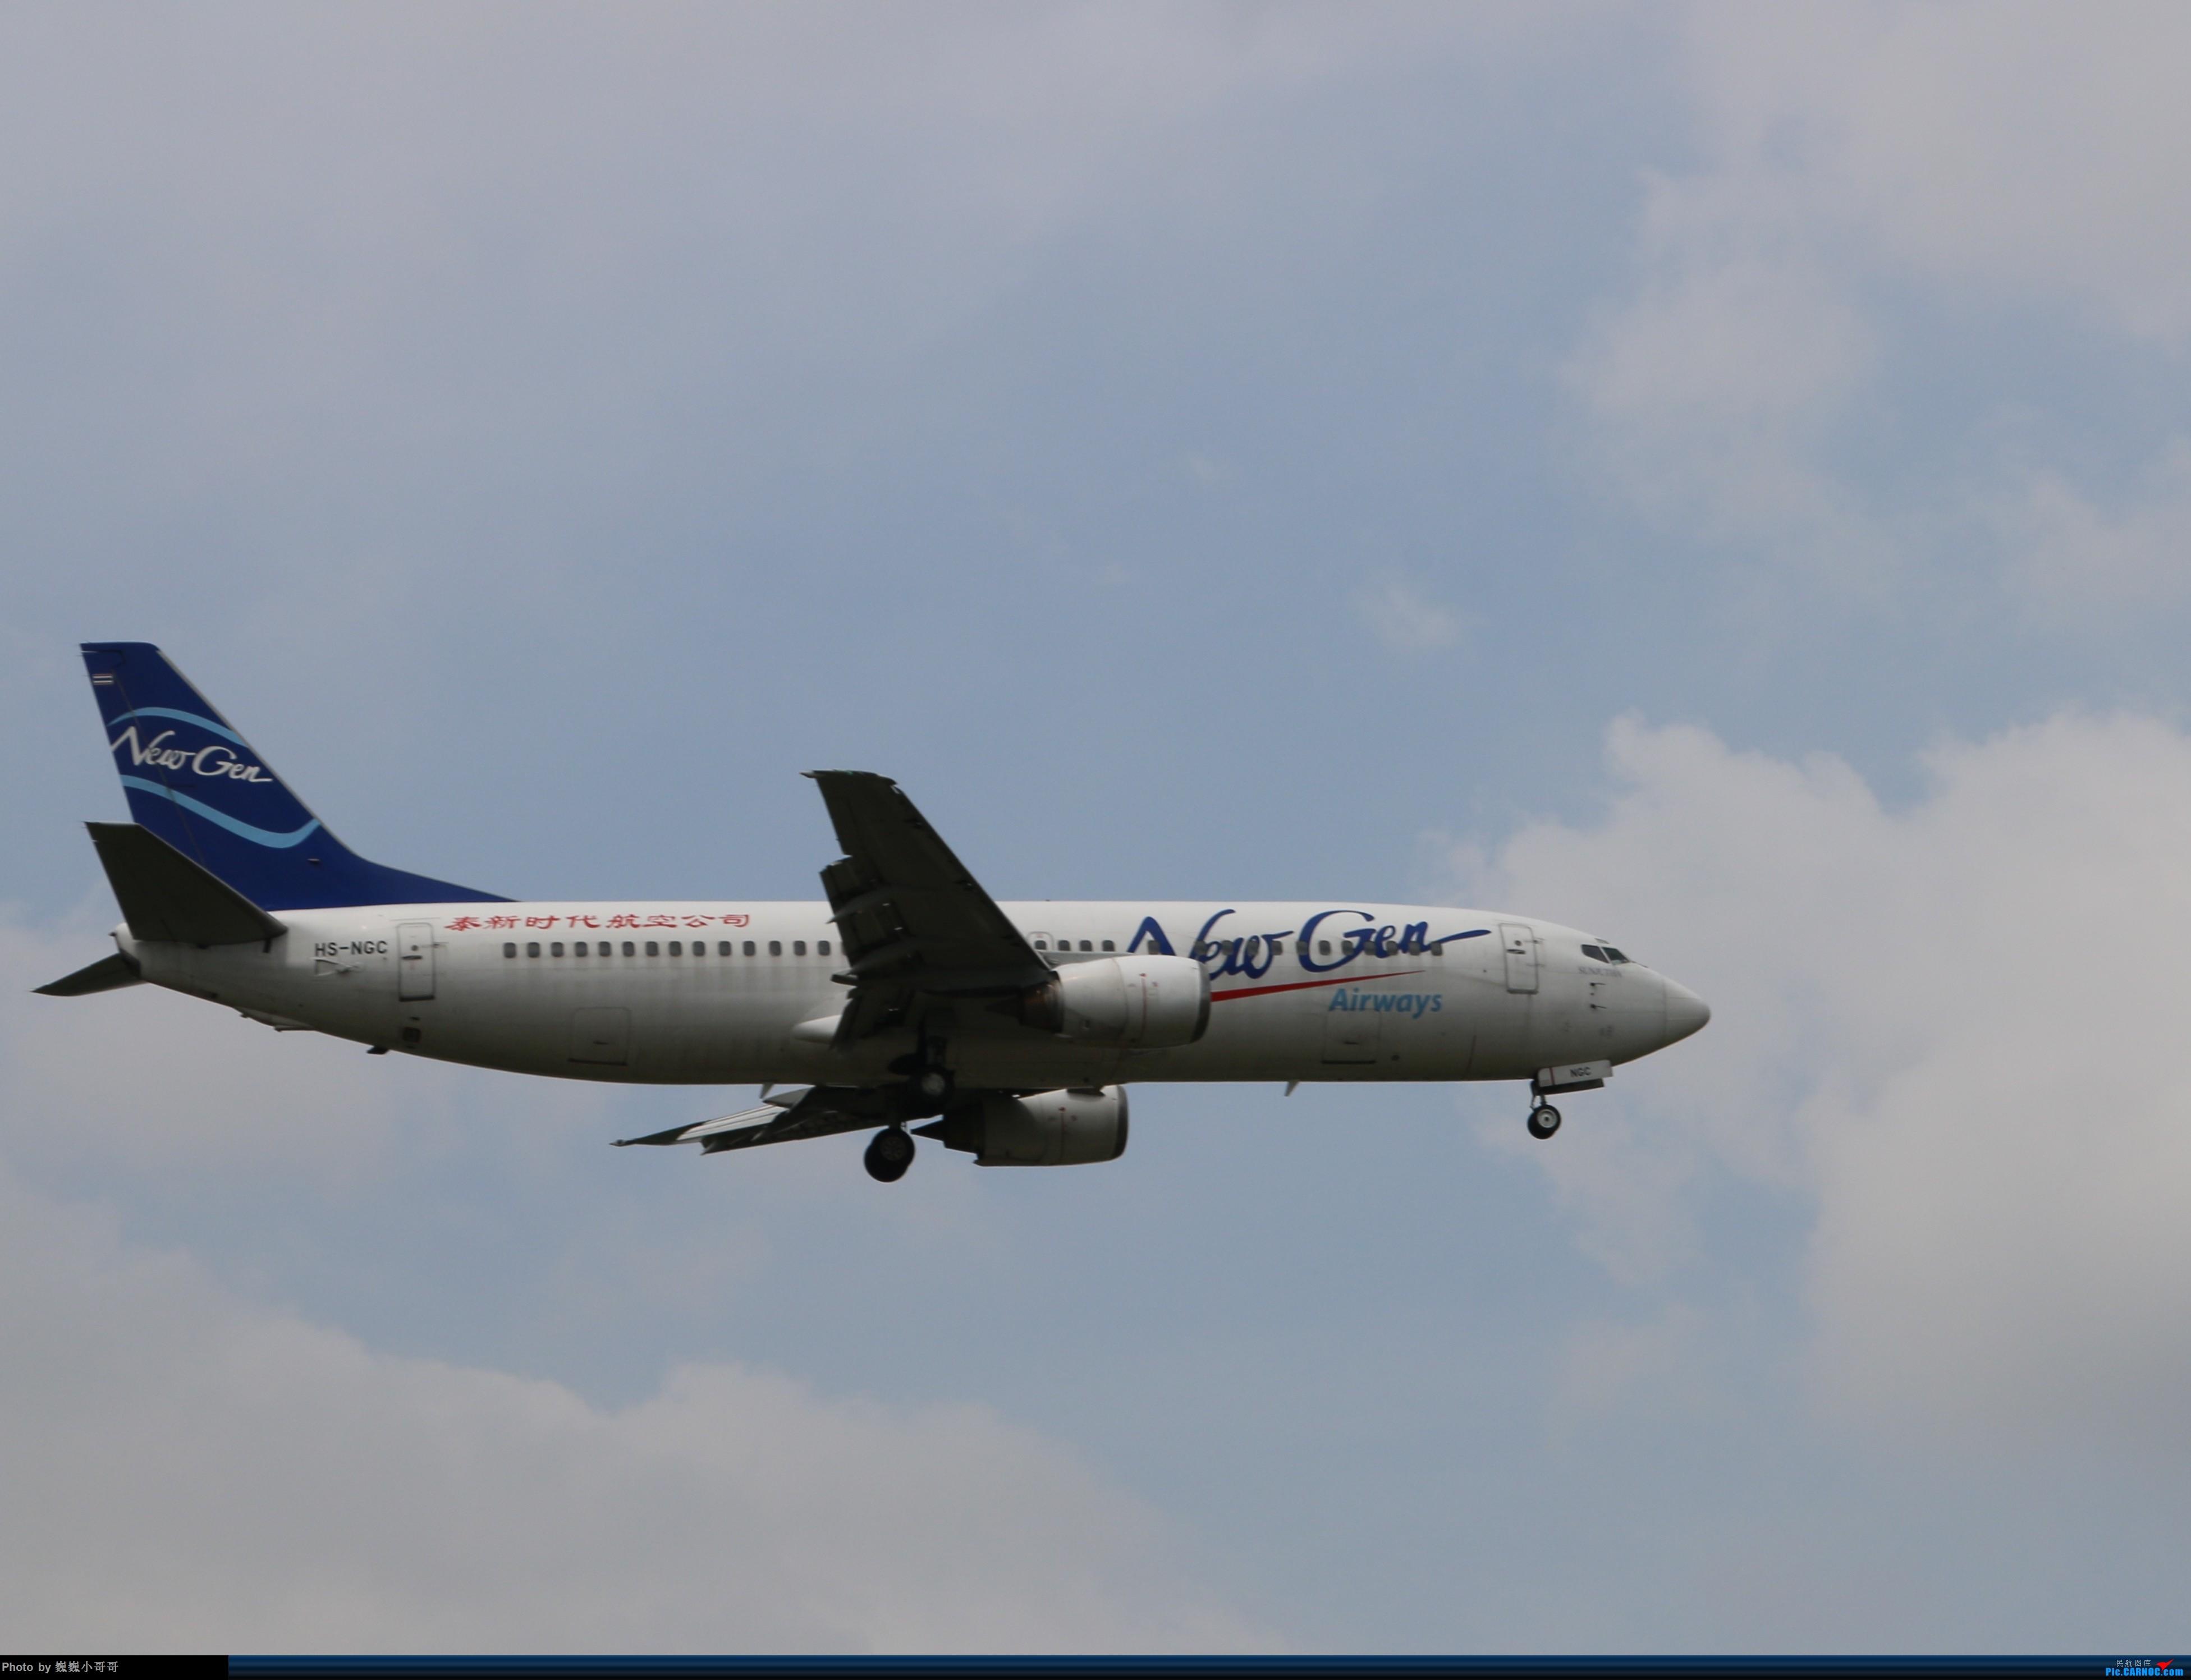 Re:[原创]长沙黄花机场拍机 BOEING 737-300 HS-NGC 中国长沙黄花国际机场